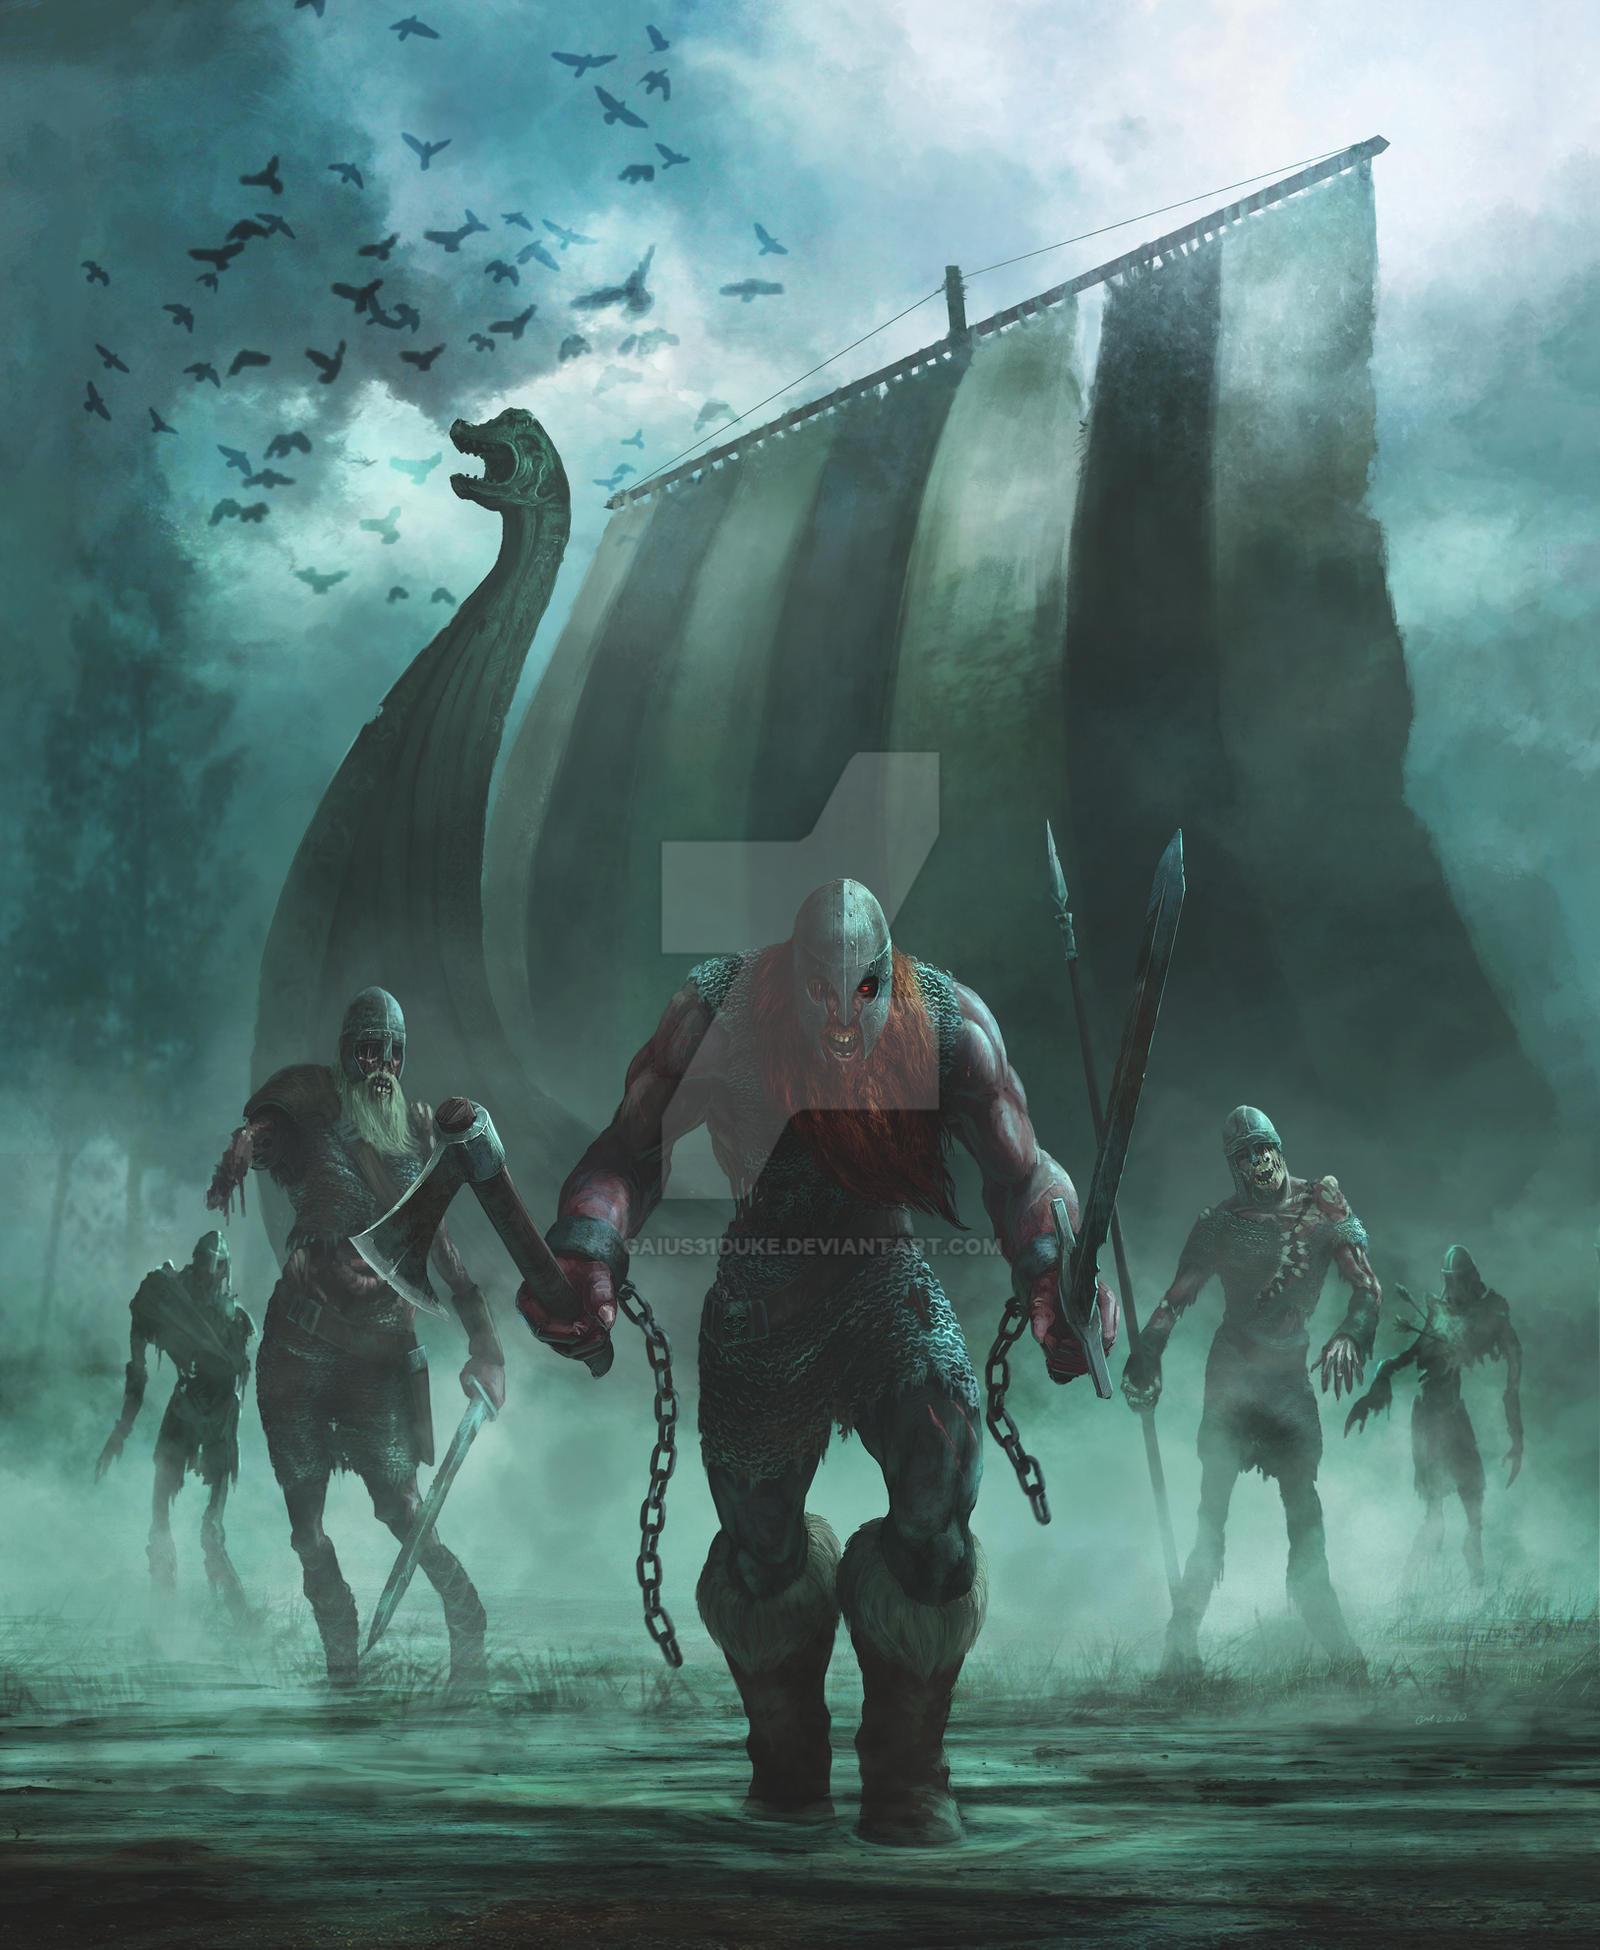 the viking dead book cover by gaius31duke on deviantart